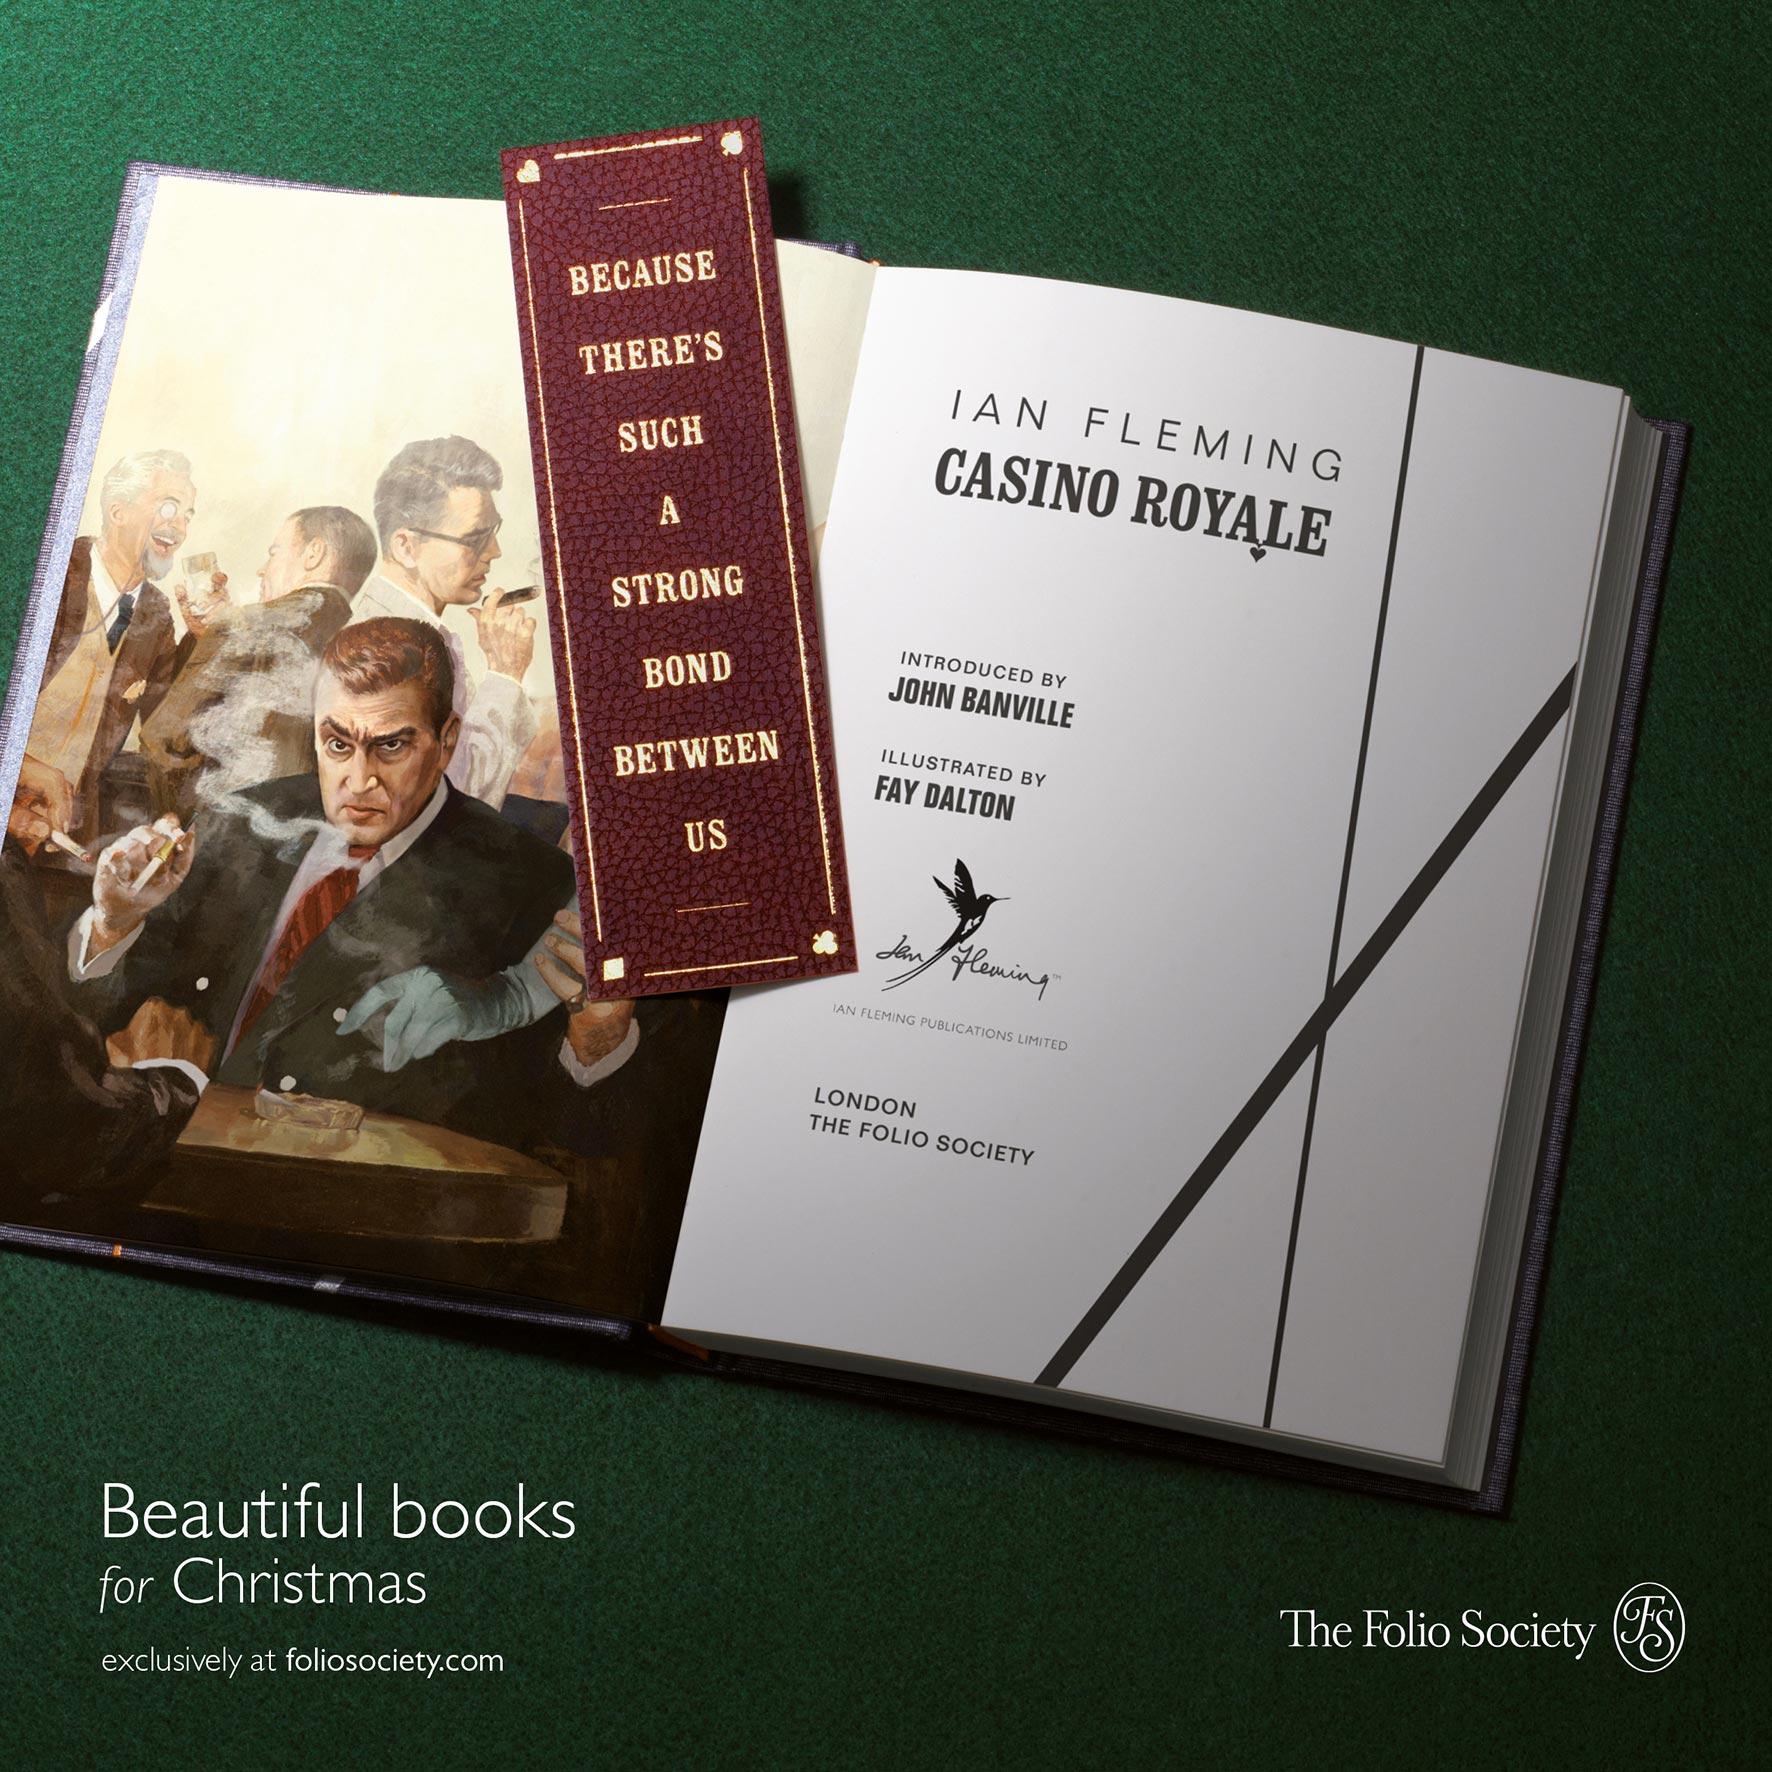 FS_Bookmarks_Christmas_OvergroundSquare_AW4_sml.jpg